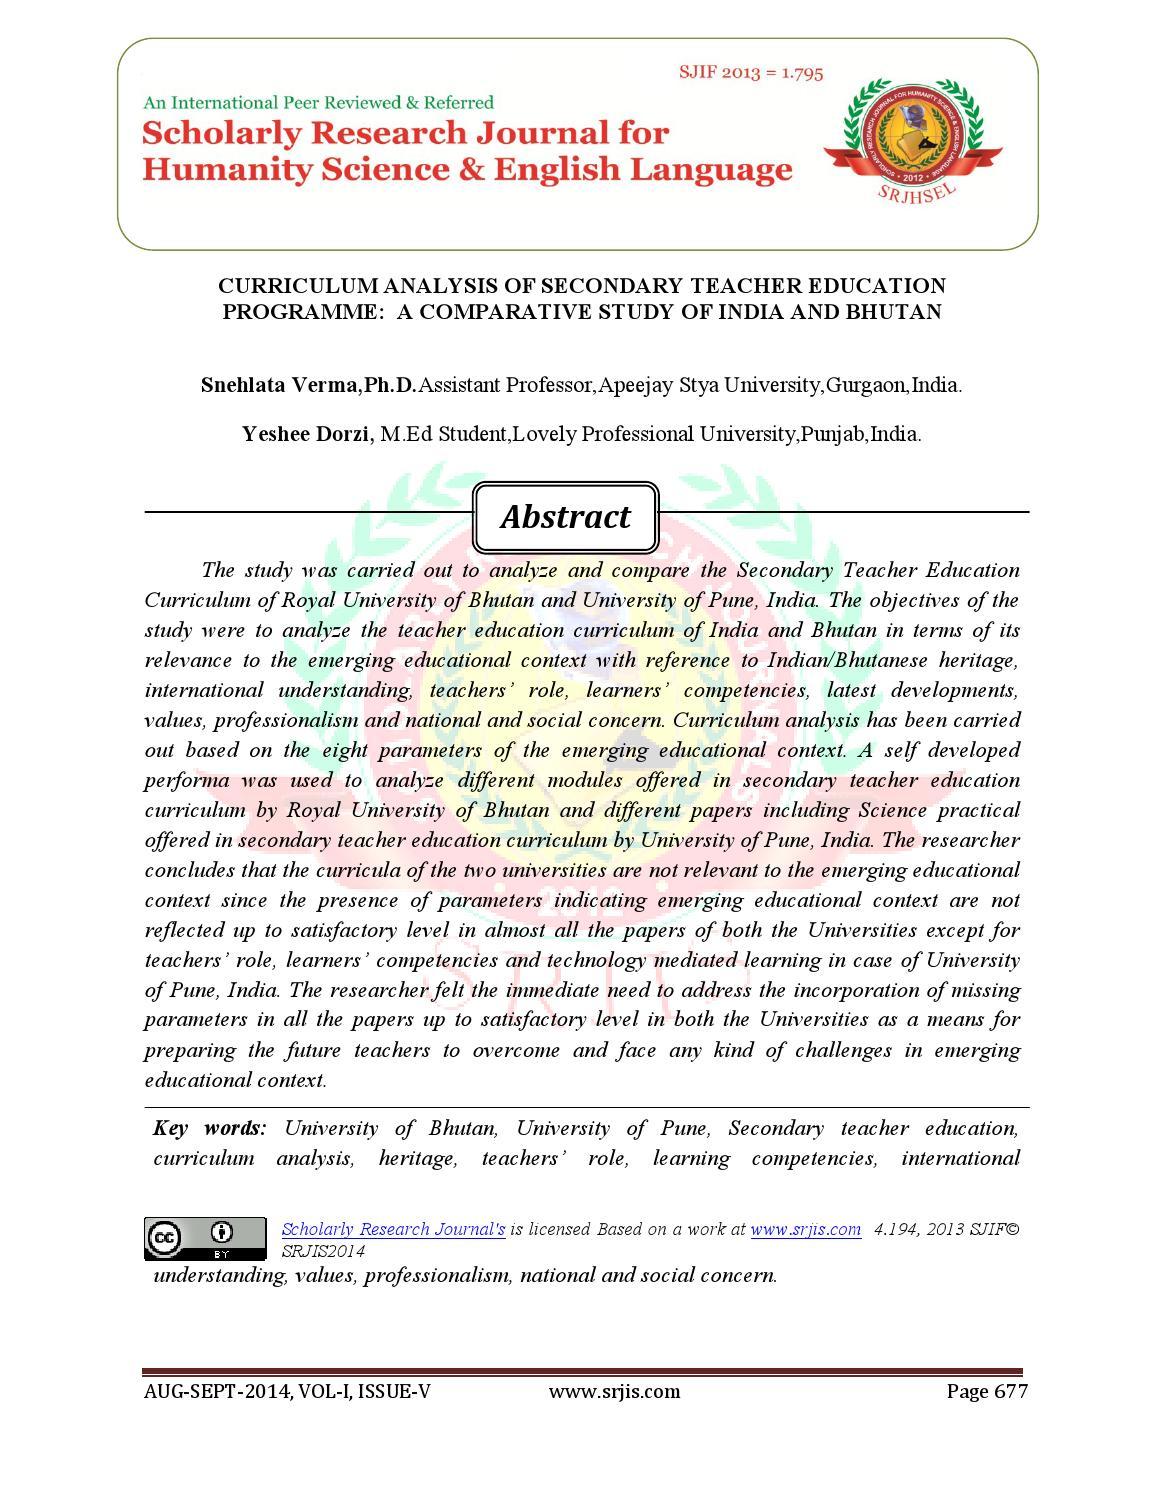 CURRICULUM ANALYSIS OF SECONDARY TEACHER EDUCATION PROGRAMME: A ...